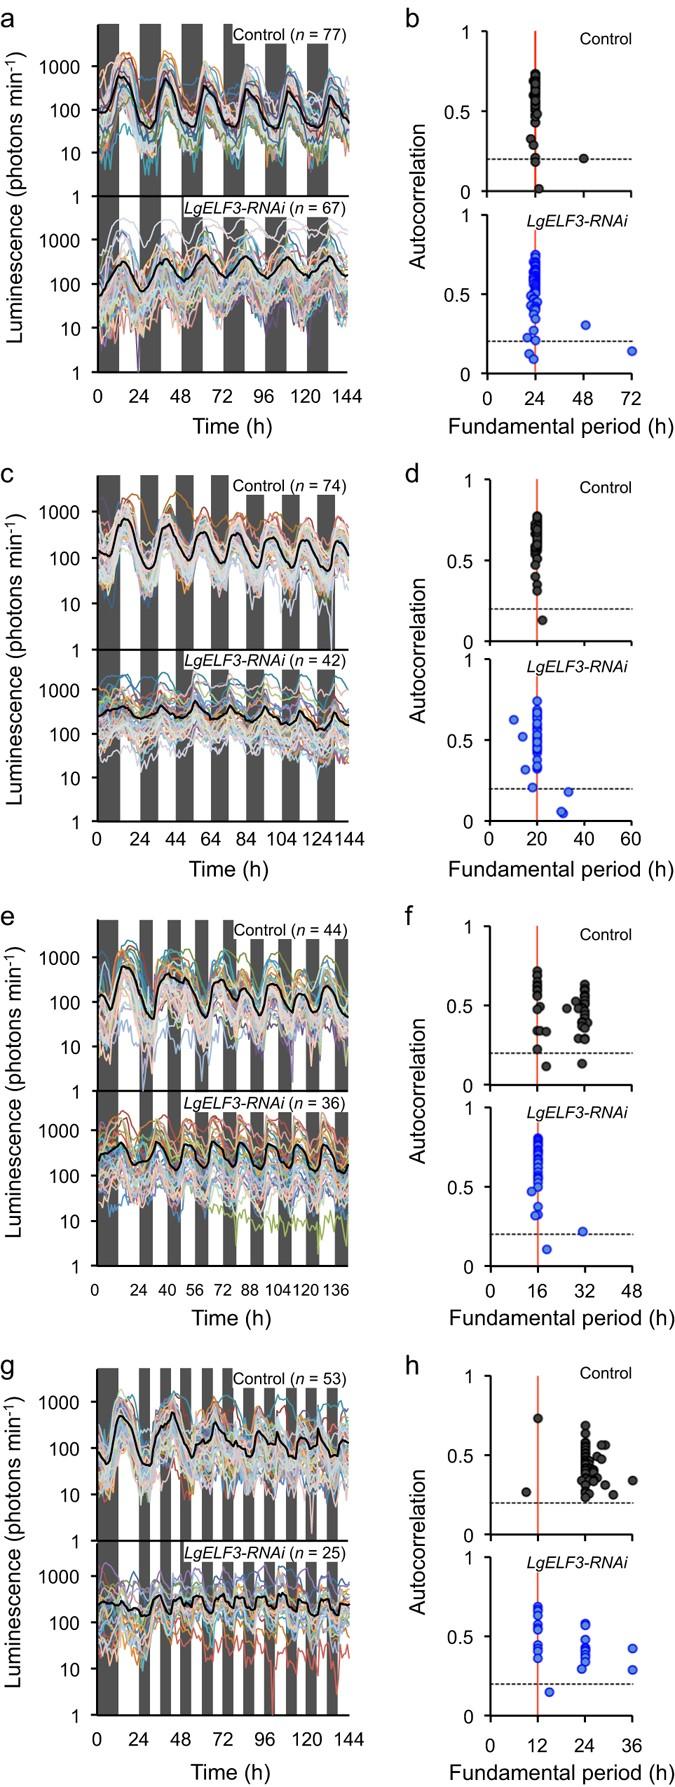 Synchrony of plant cellular circadian clocks with